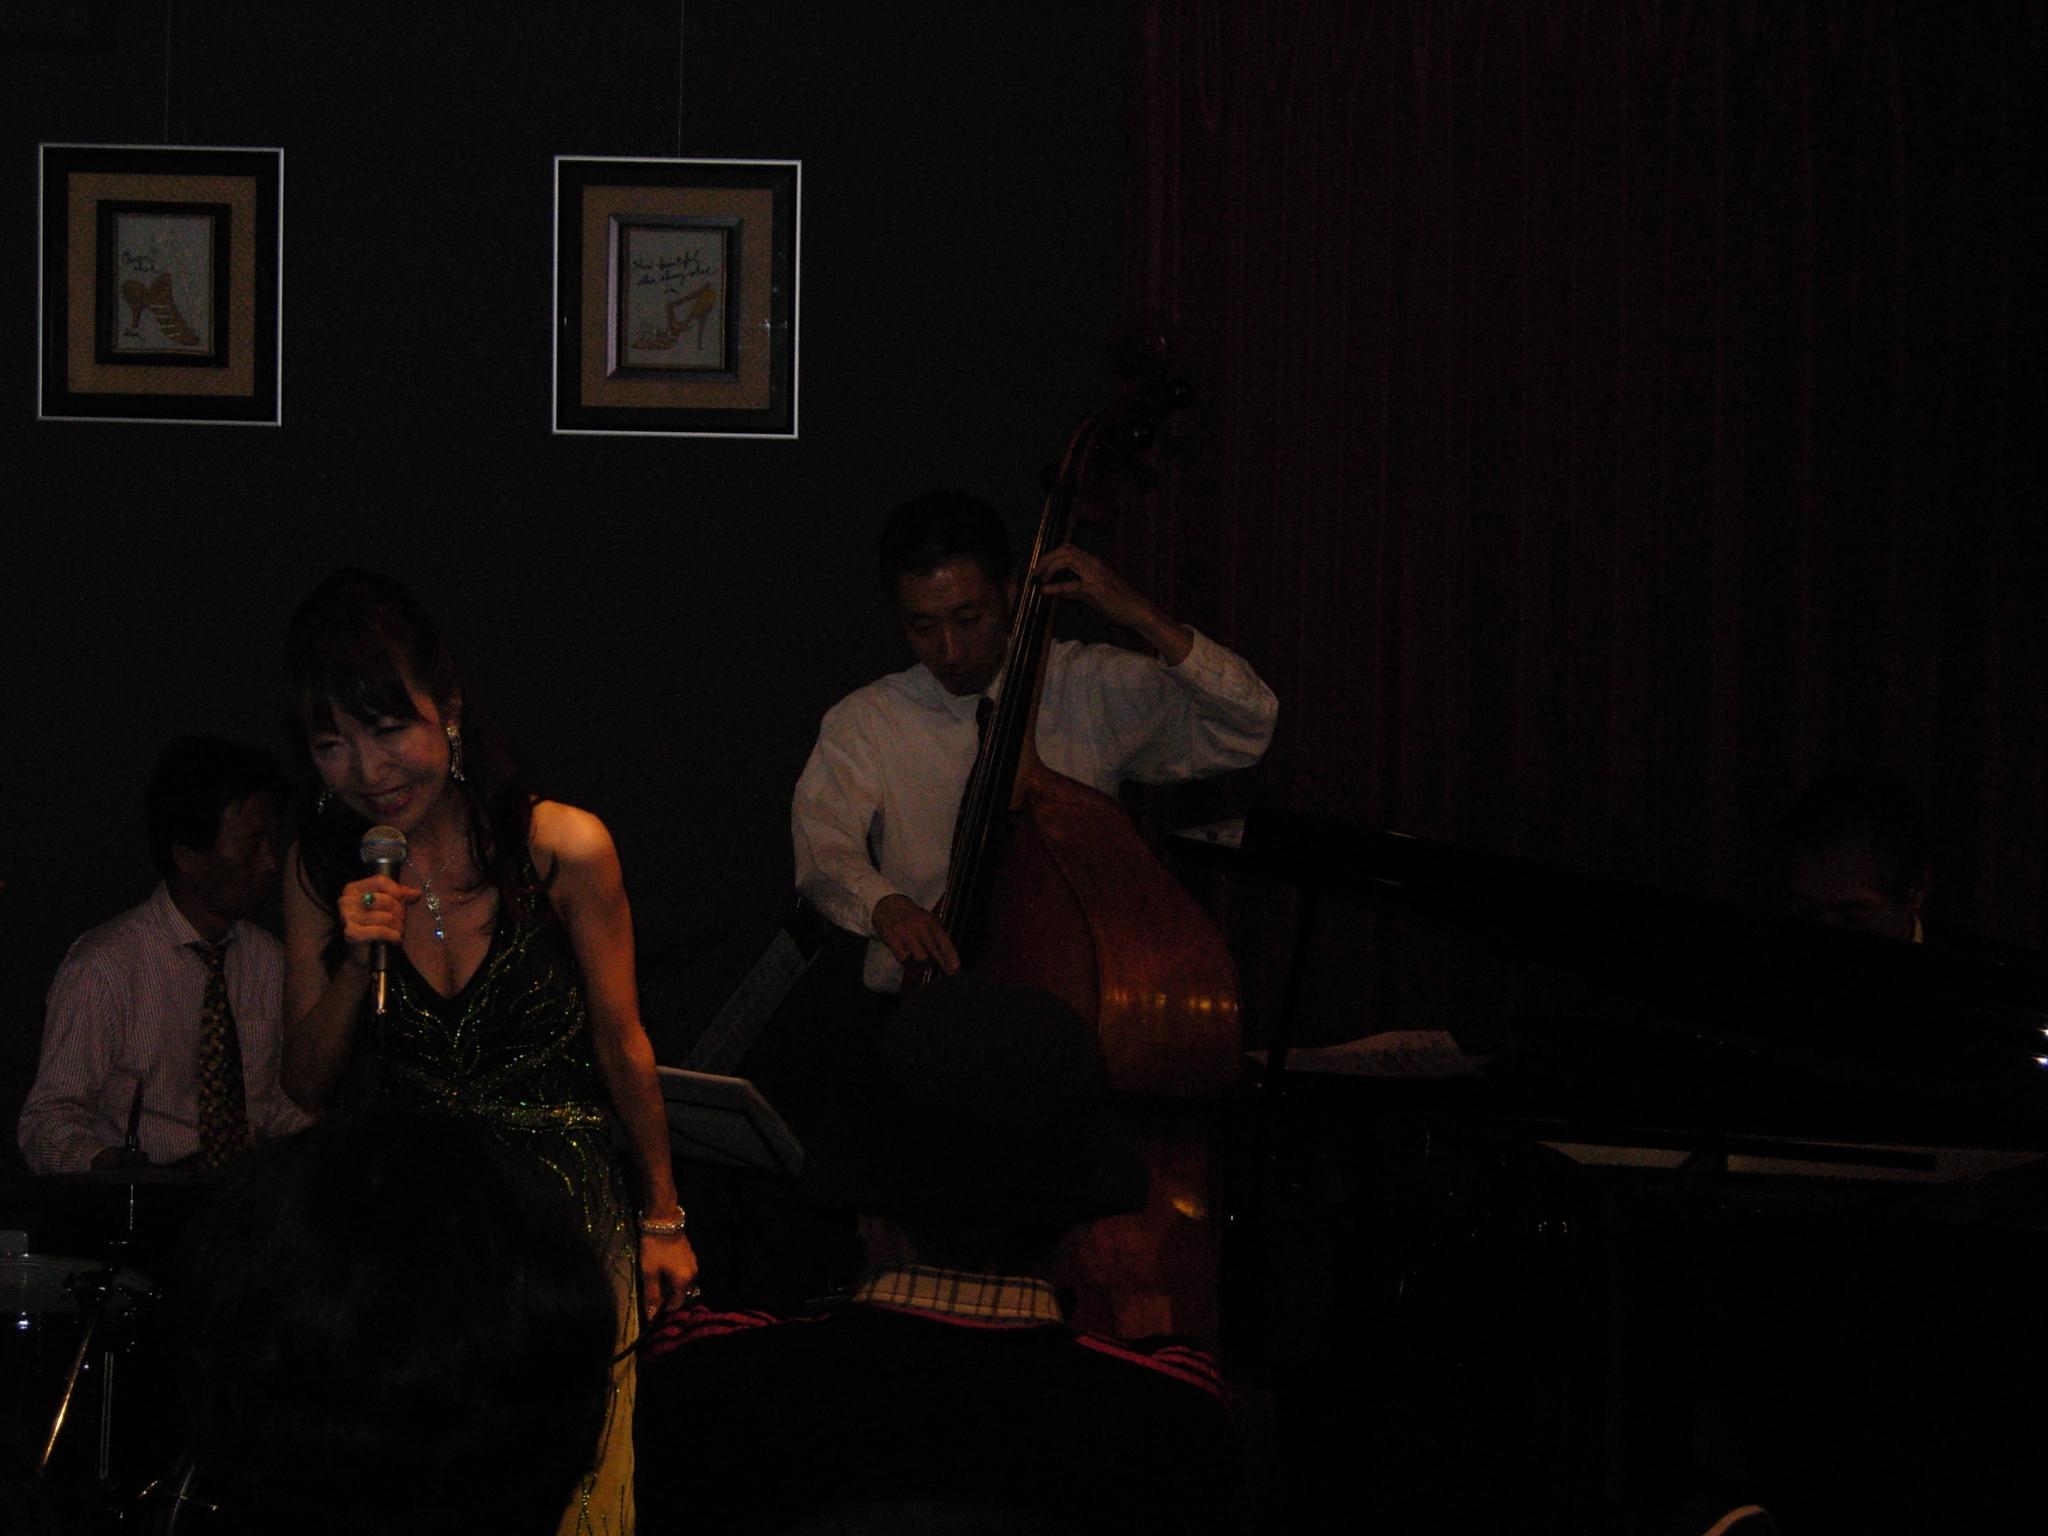 http://chanter-yachiyo.com/2010/11/23/2010_1120_210522-DSCN1351.JPG